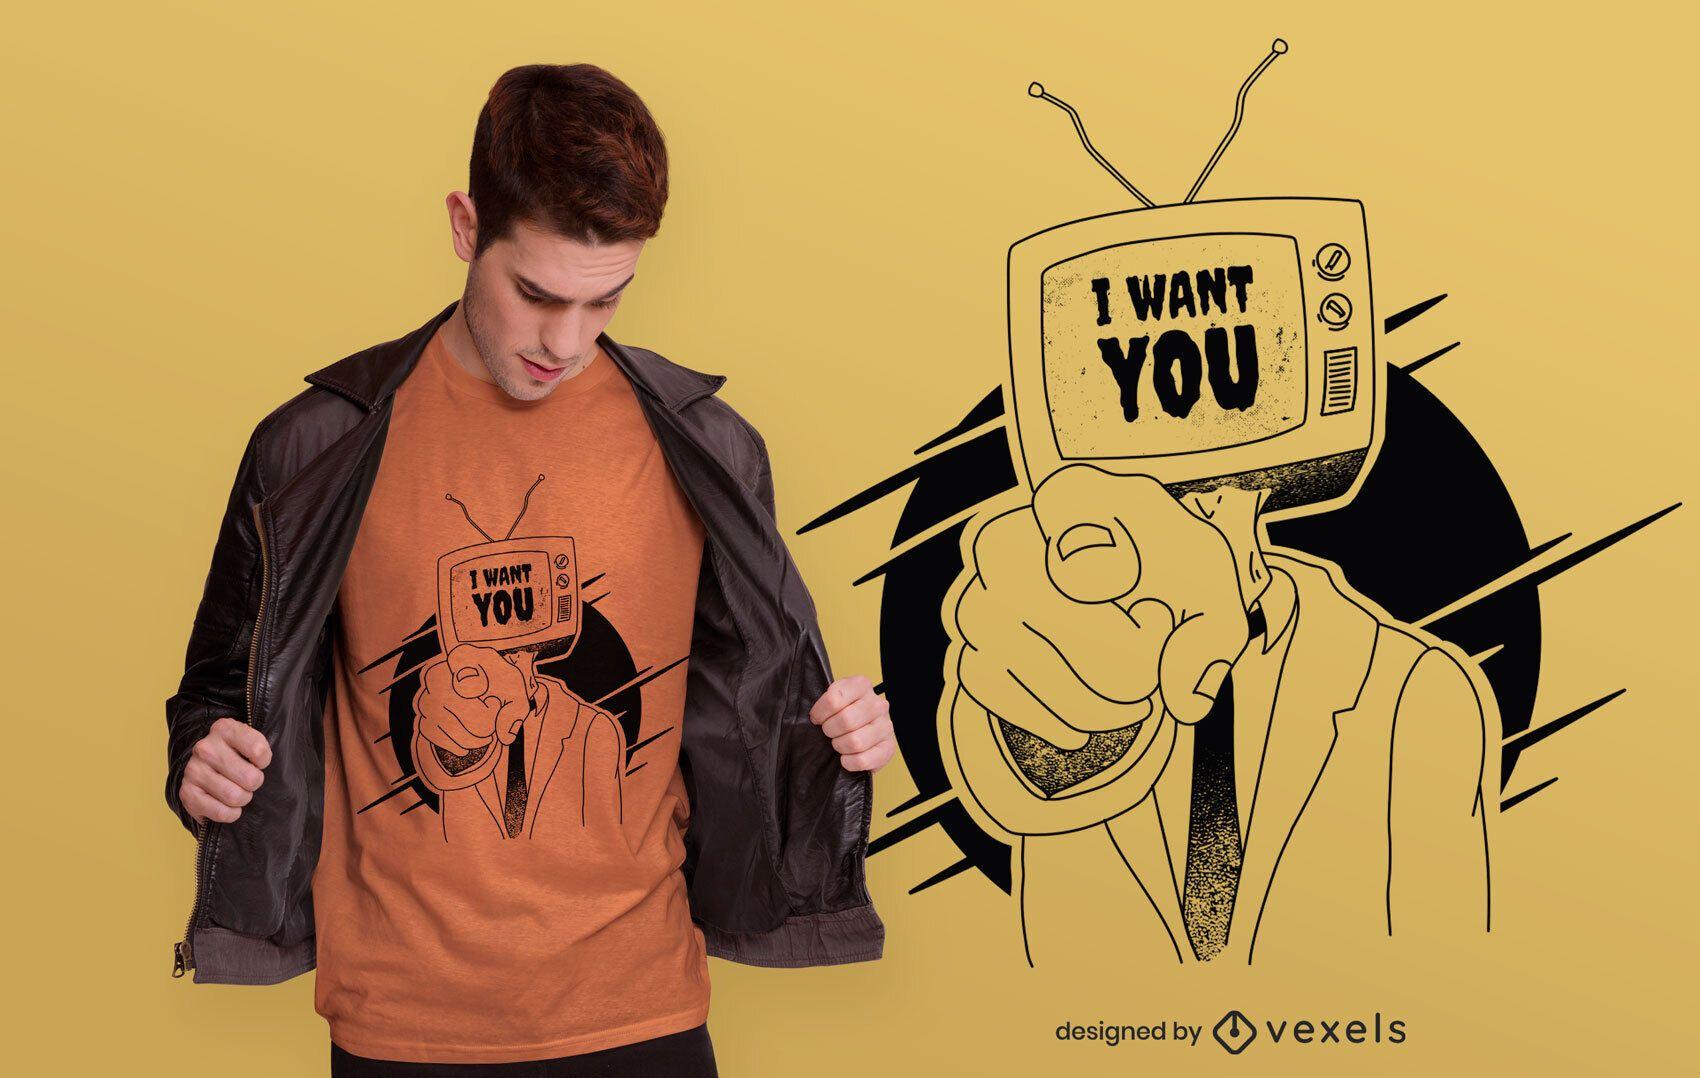 I want you t-shirt design